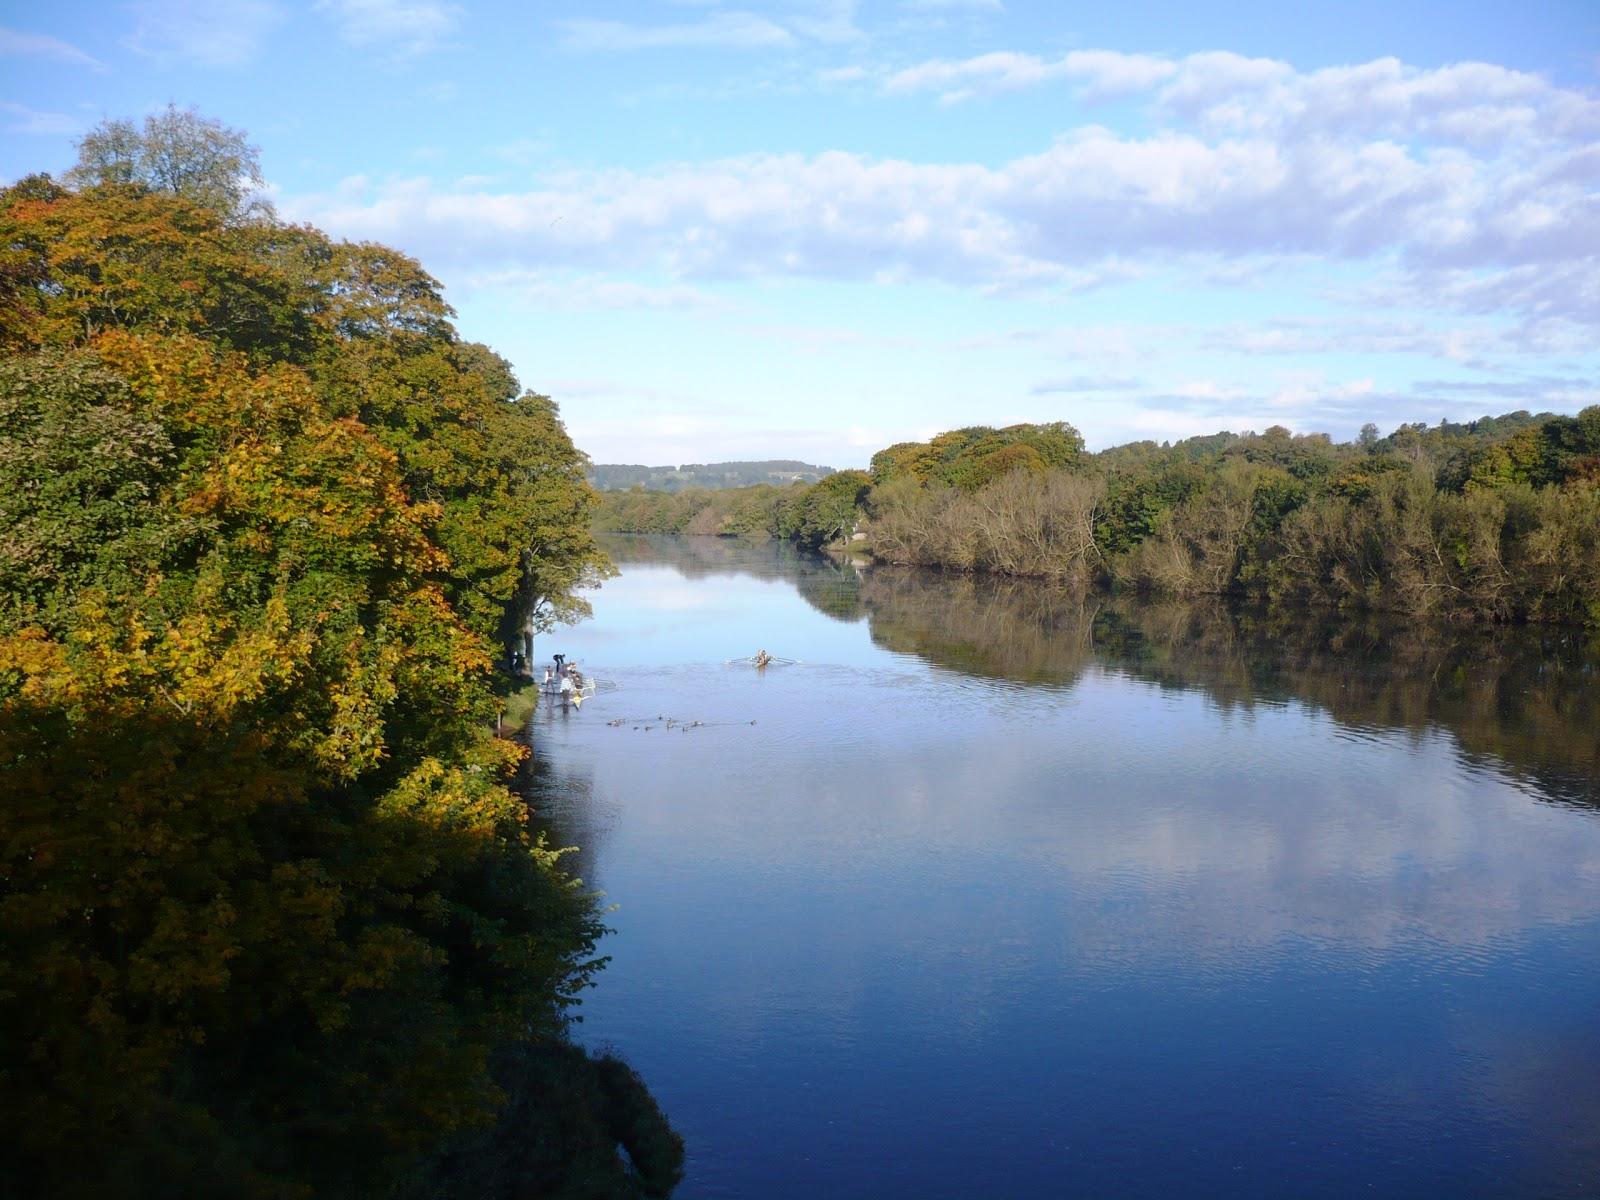 http://2.bp.blogspot.com/-NVy_yeJnINE/UIs9nZMvvSI/AAAAAAAABqo/H2cIfcYmMOw/s1600/River+Tyne+at+Hexham.JPG